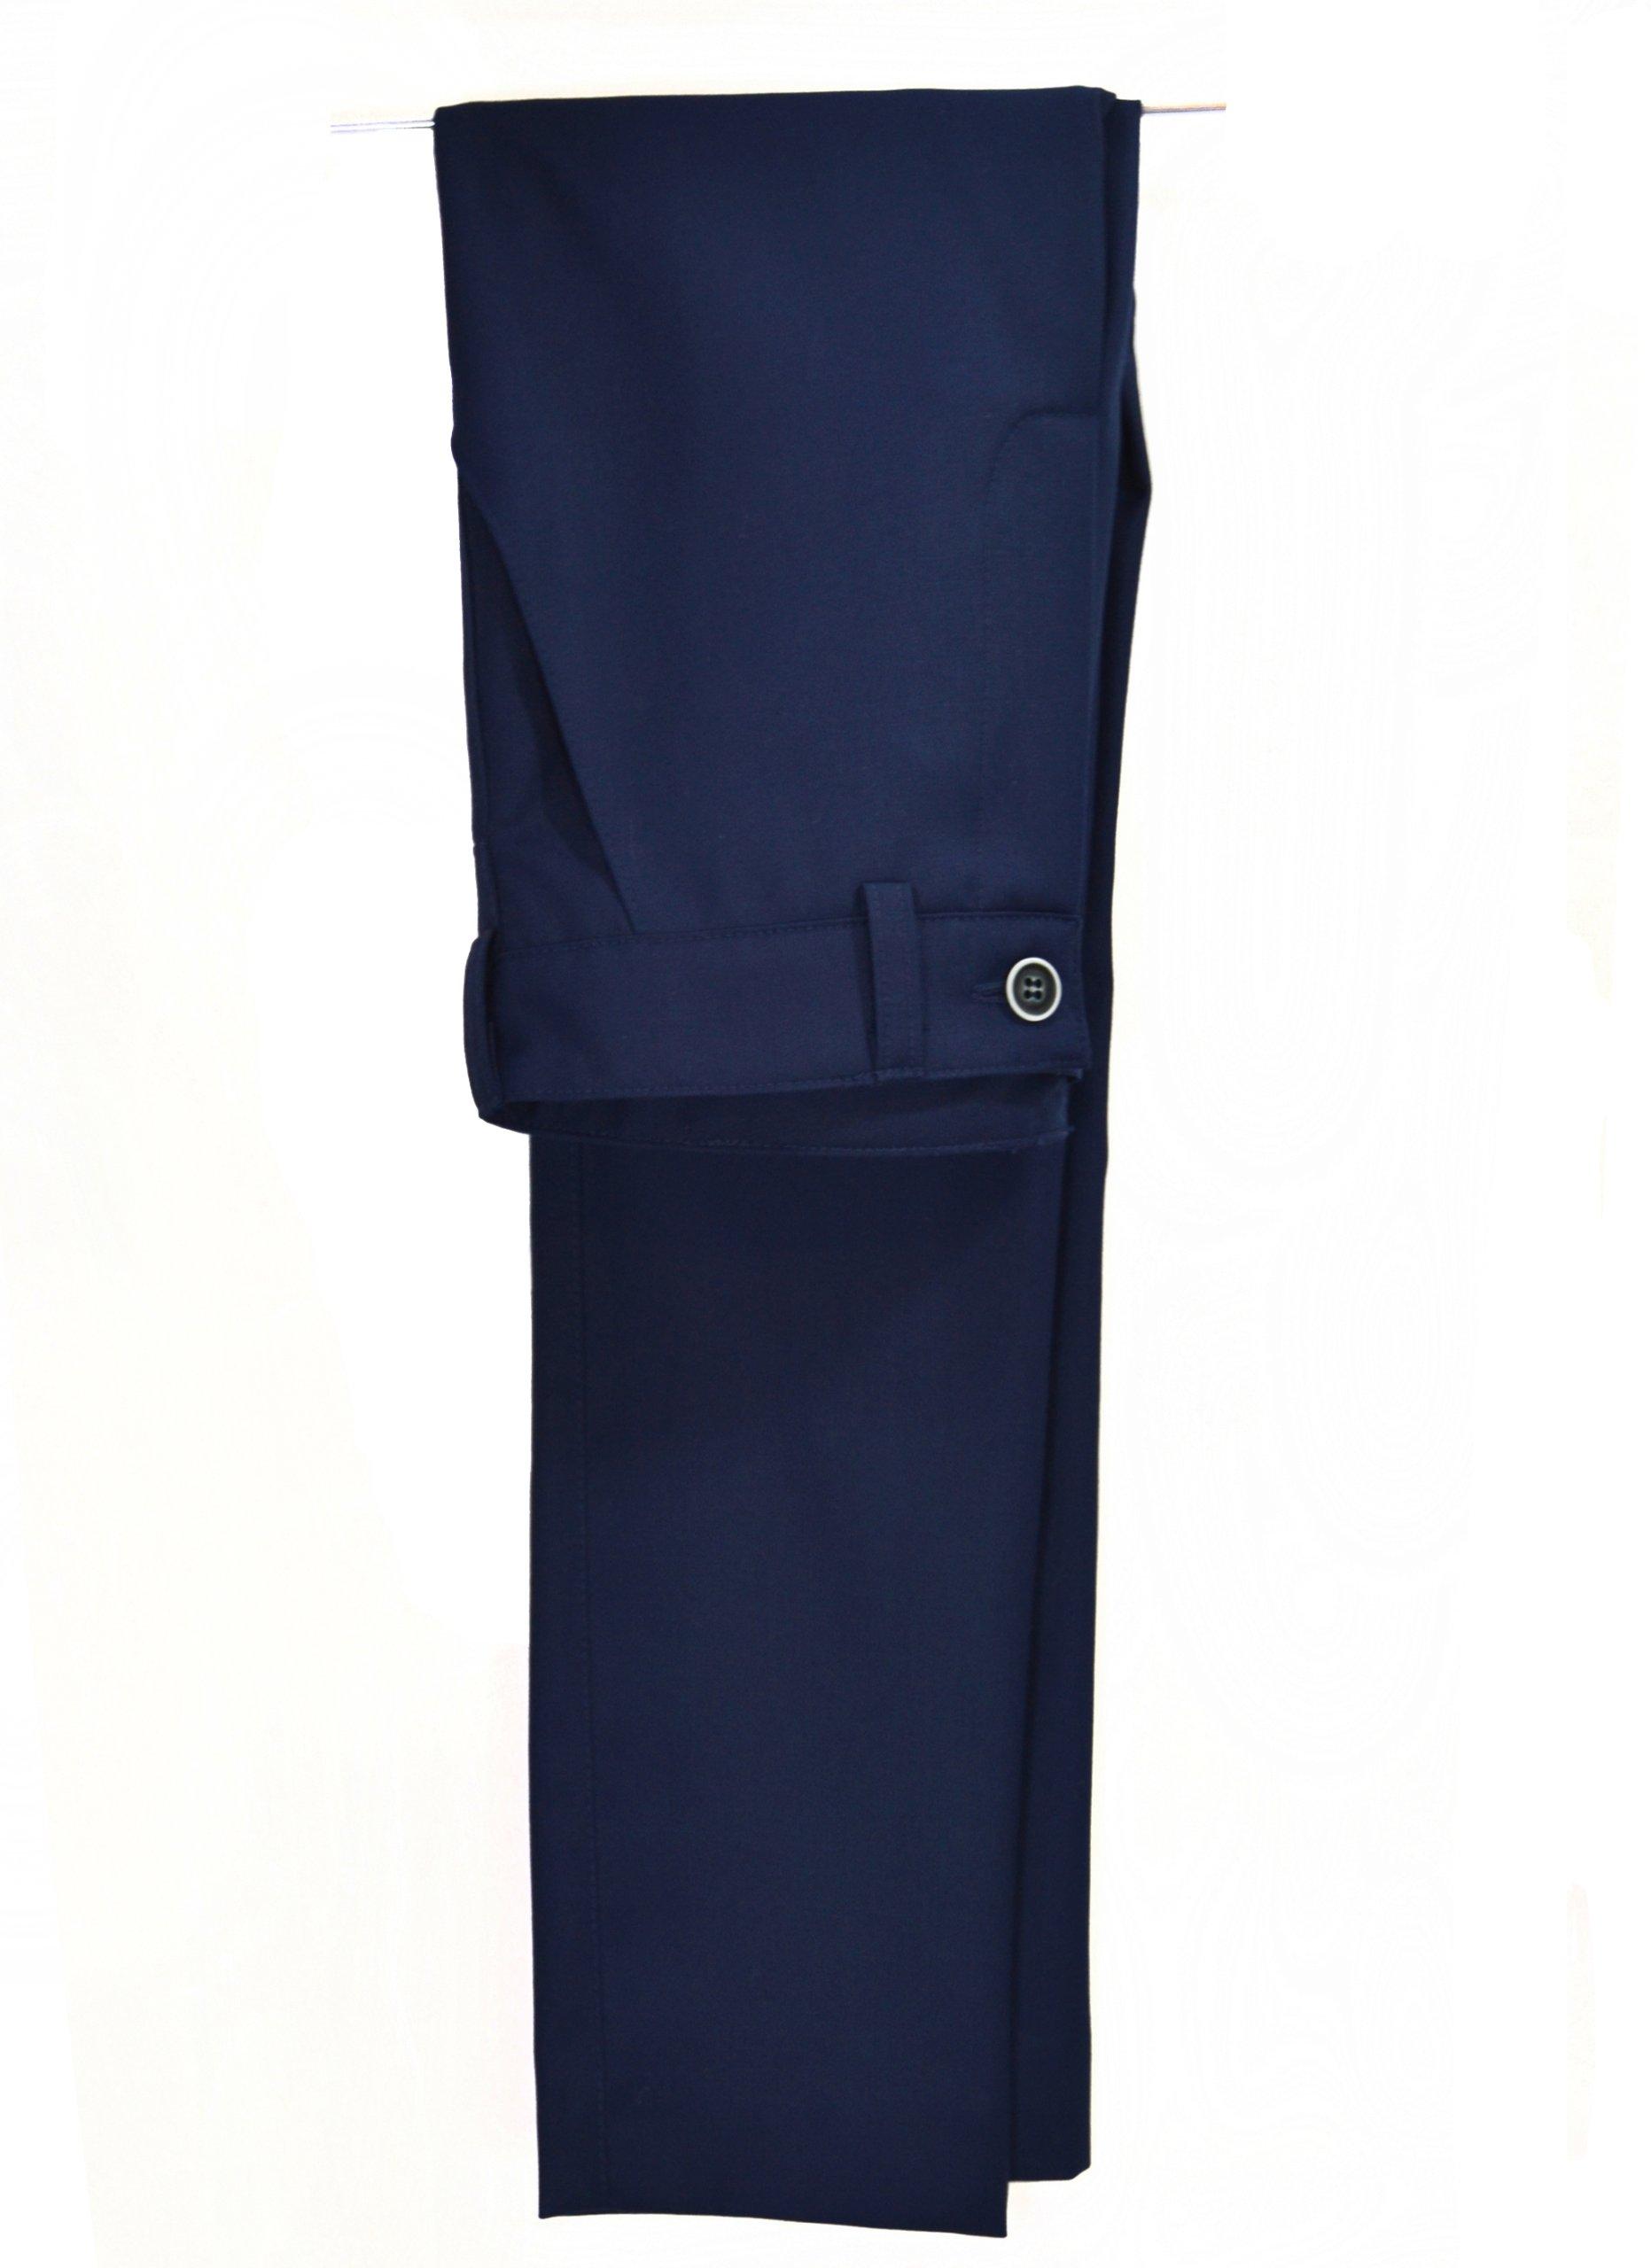 Elegantné nohavice, BEZ KANTU, tmavo modrá SLIM 134